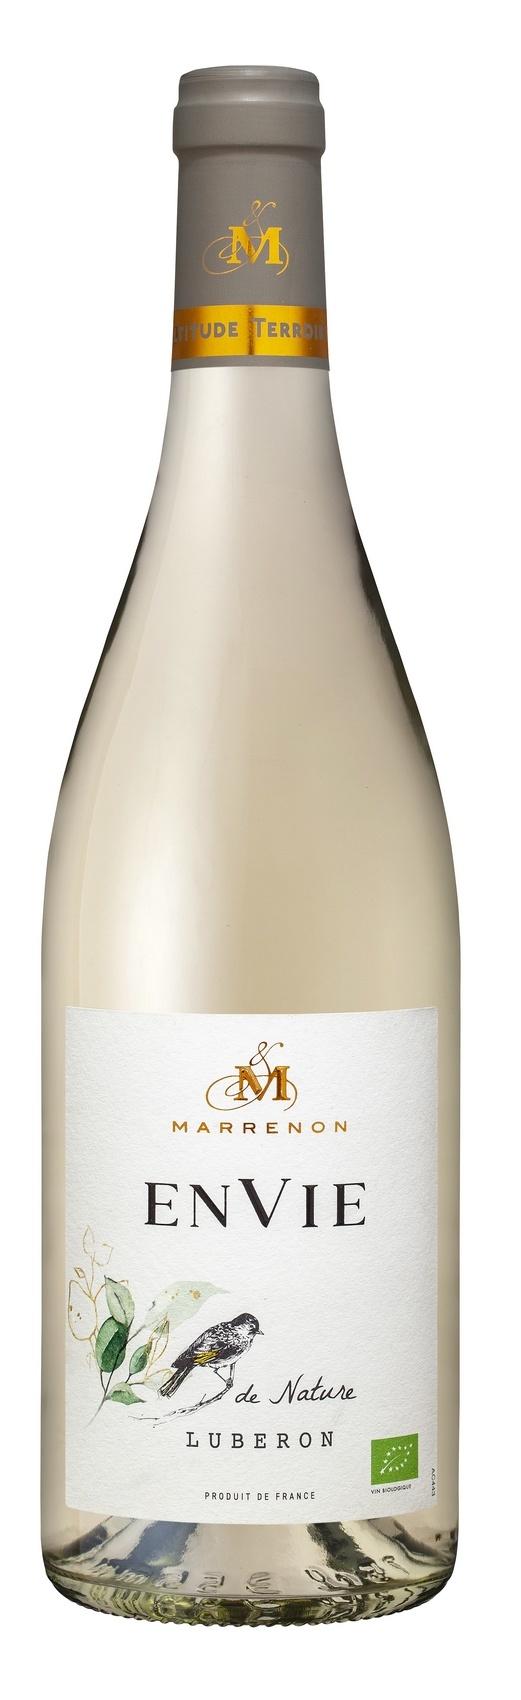 Marrenon Envie de Nature Bio Blanc, 2020, Luberon, Frankrijk, Witte wijn